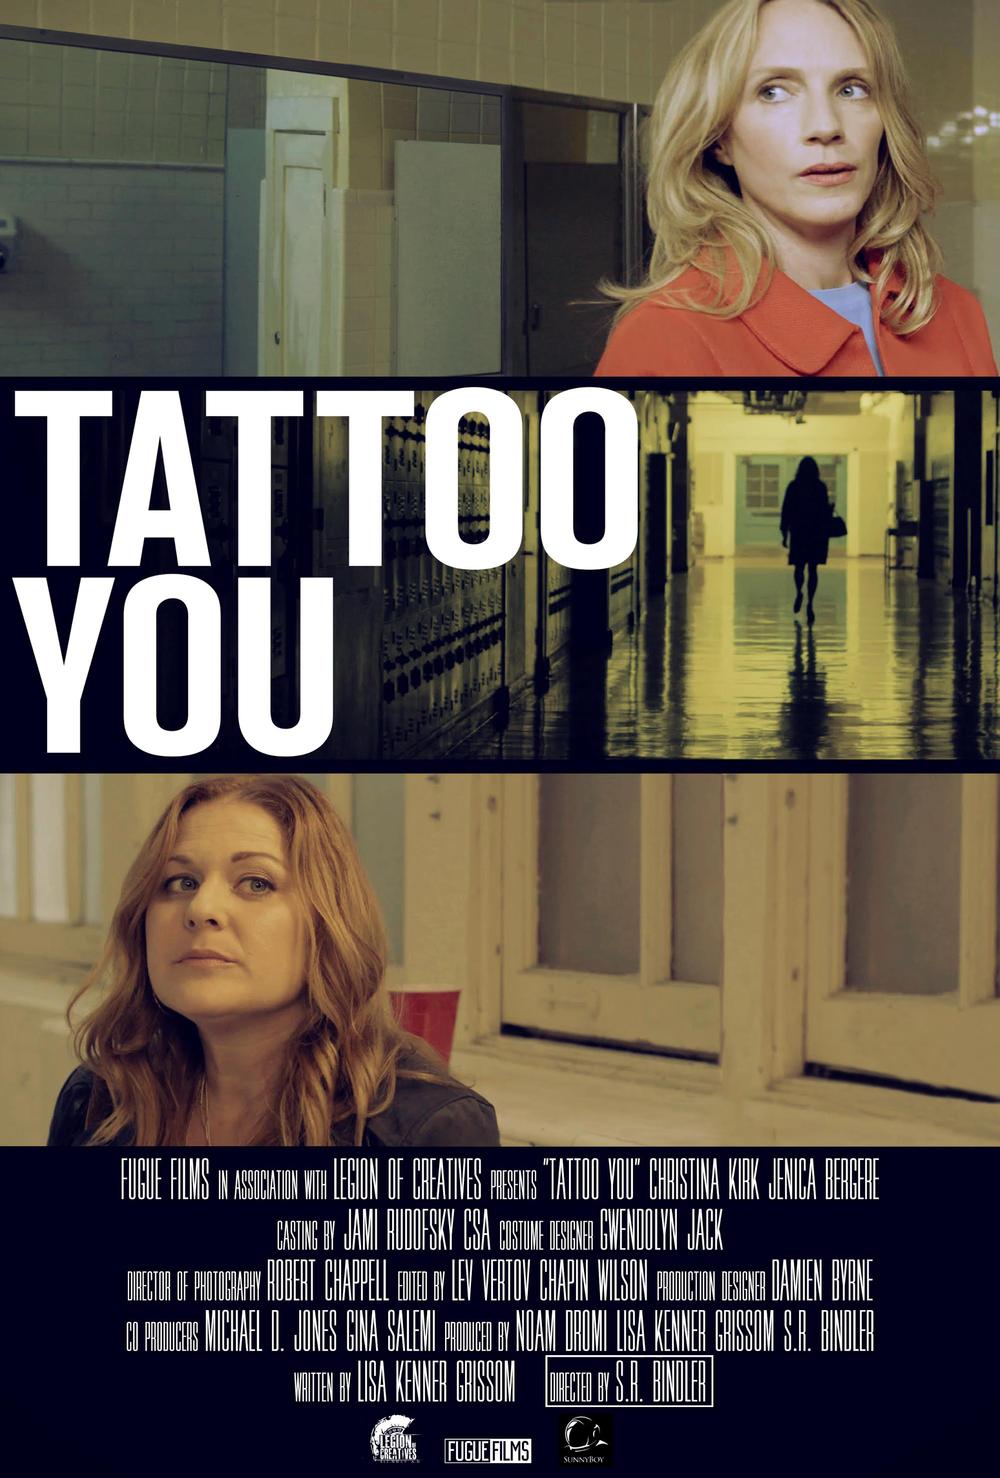 Tattoo You Poster CoriNologo.jpg